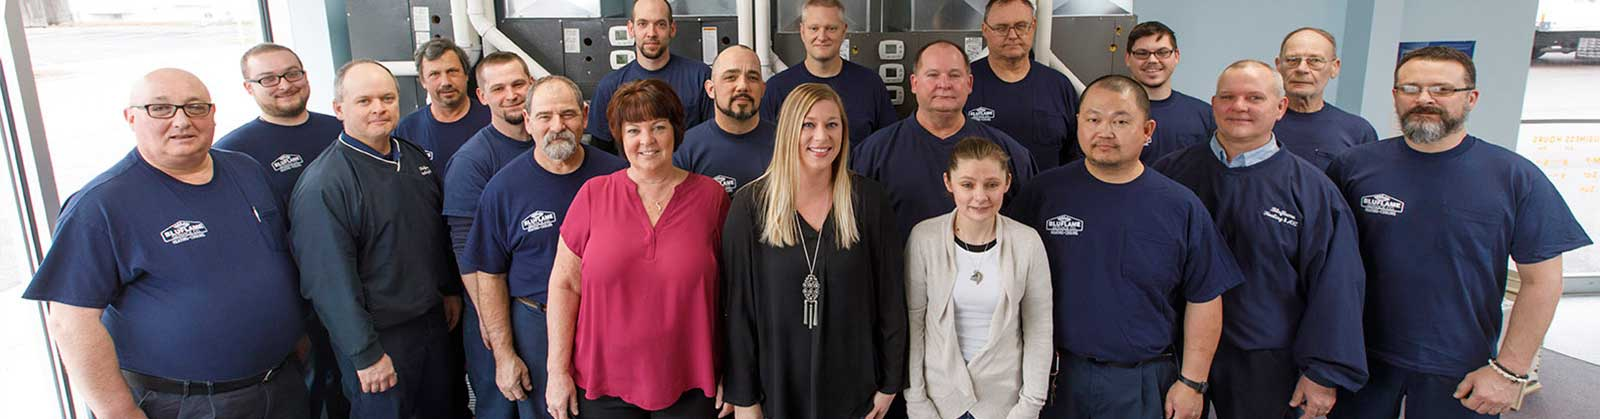 Bluflame service company toledo team